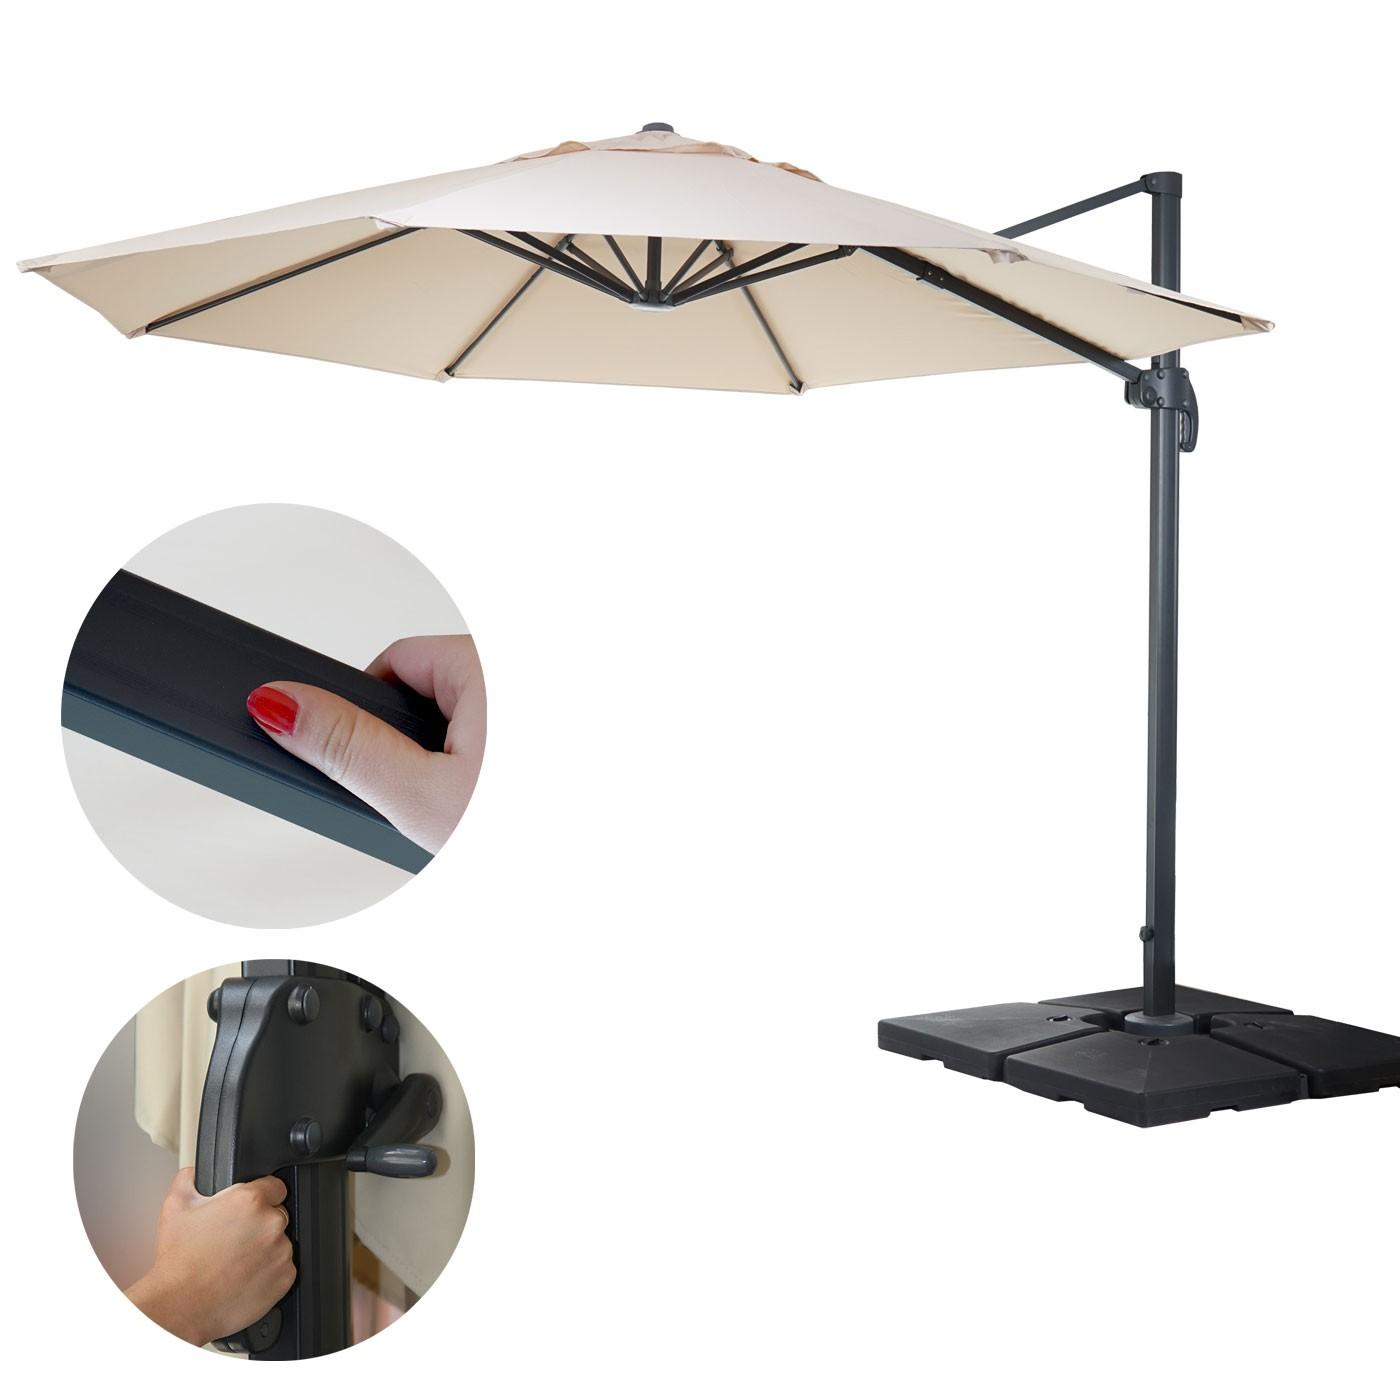 gastronomie luxus ampelschirm sonnenschirm 4m garten sonnenschirme und st nder ampelschirme. Black Bedroom Furniture Sets. Home Design Ideas